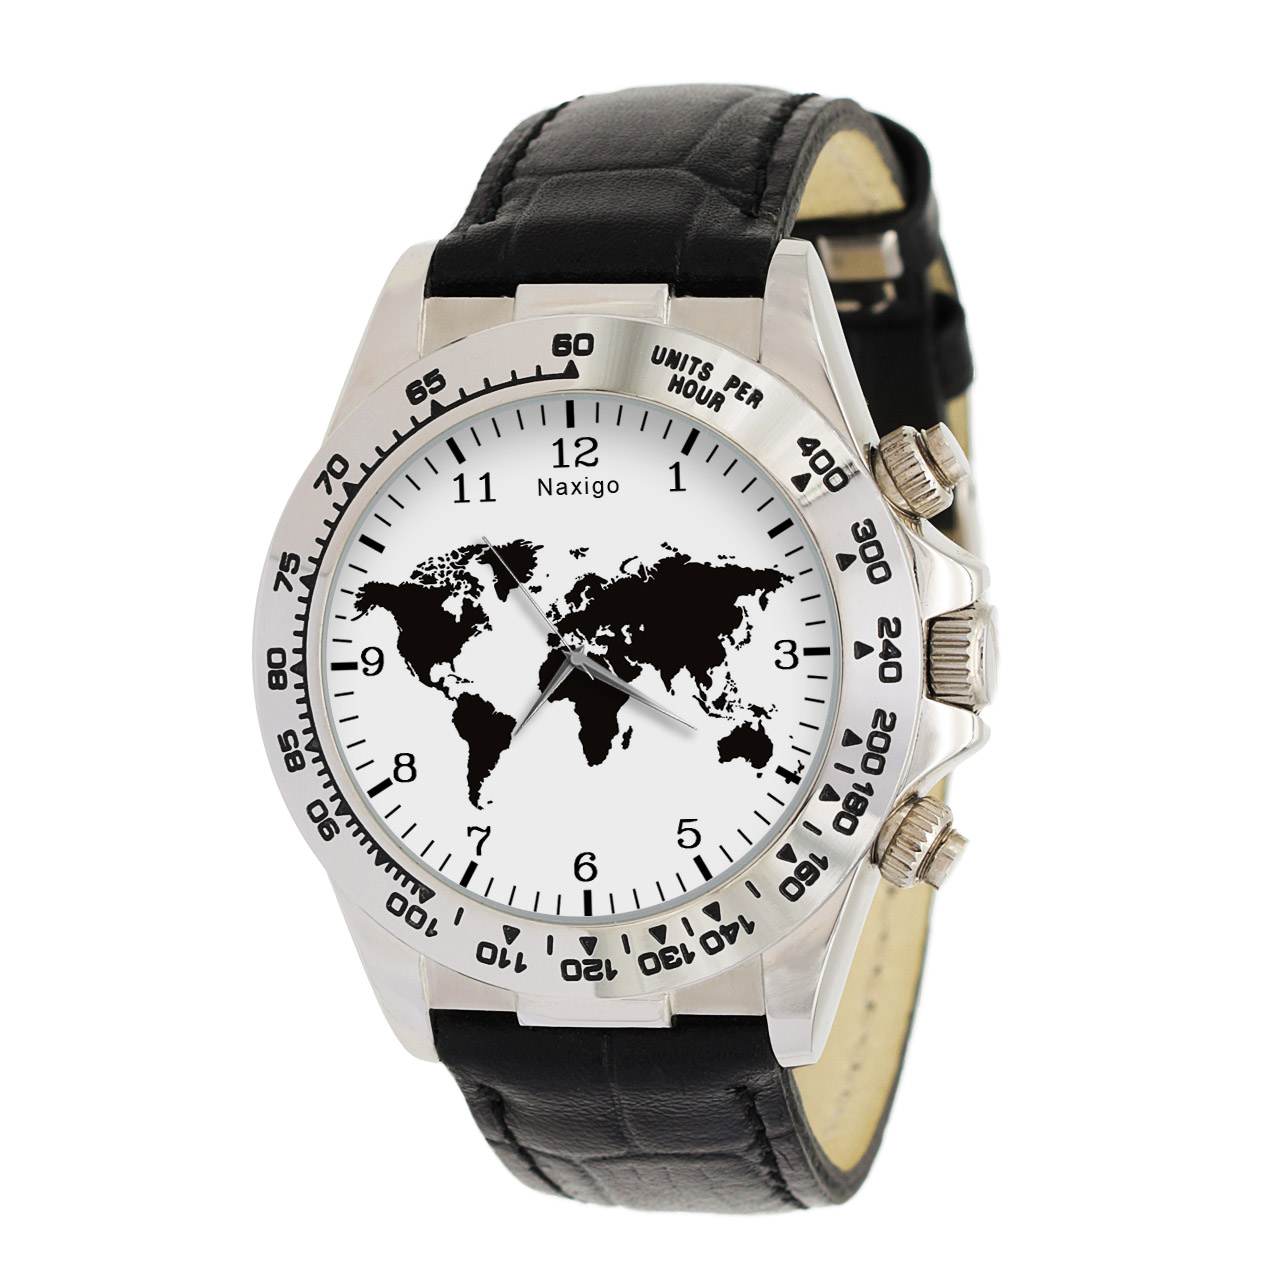 ساعت مچی  مردانه ناکسیگو طرح نقشه جهان کد LS3518